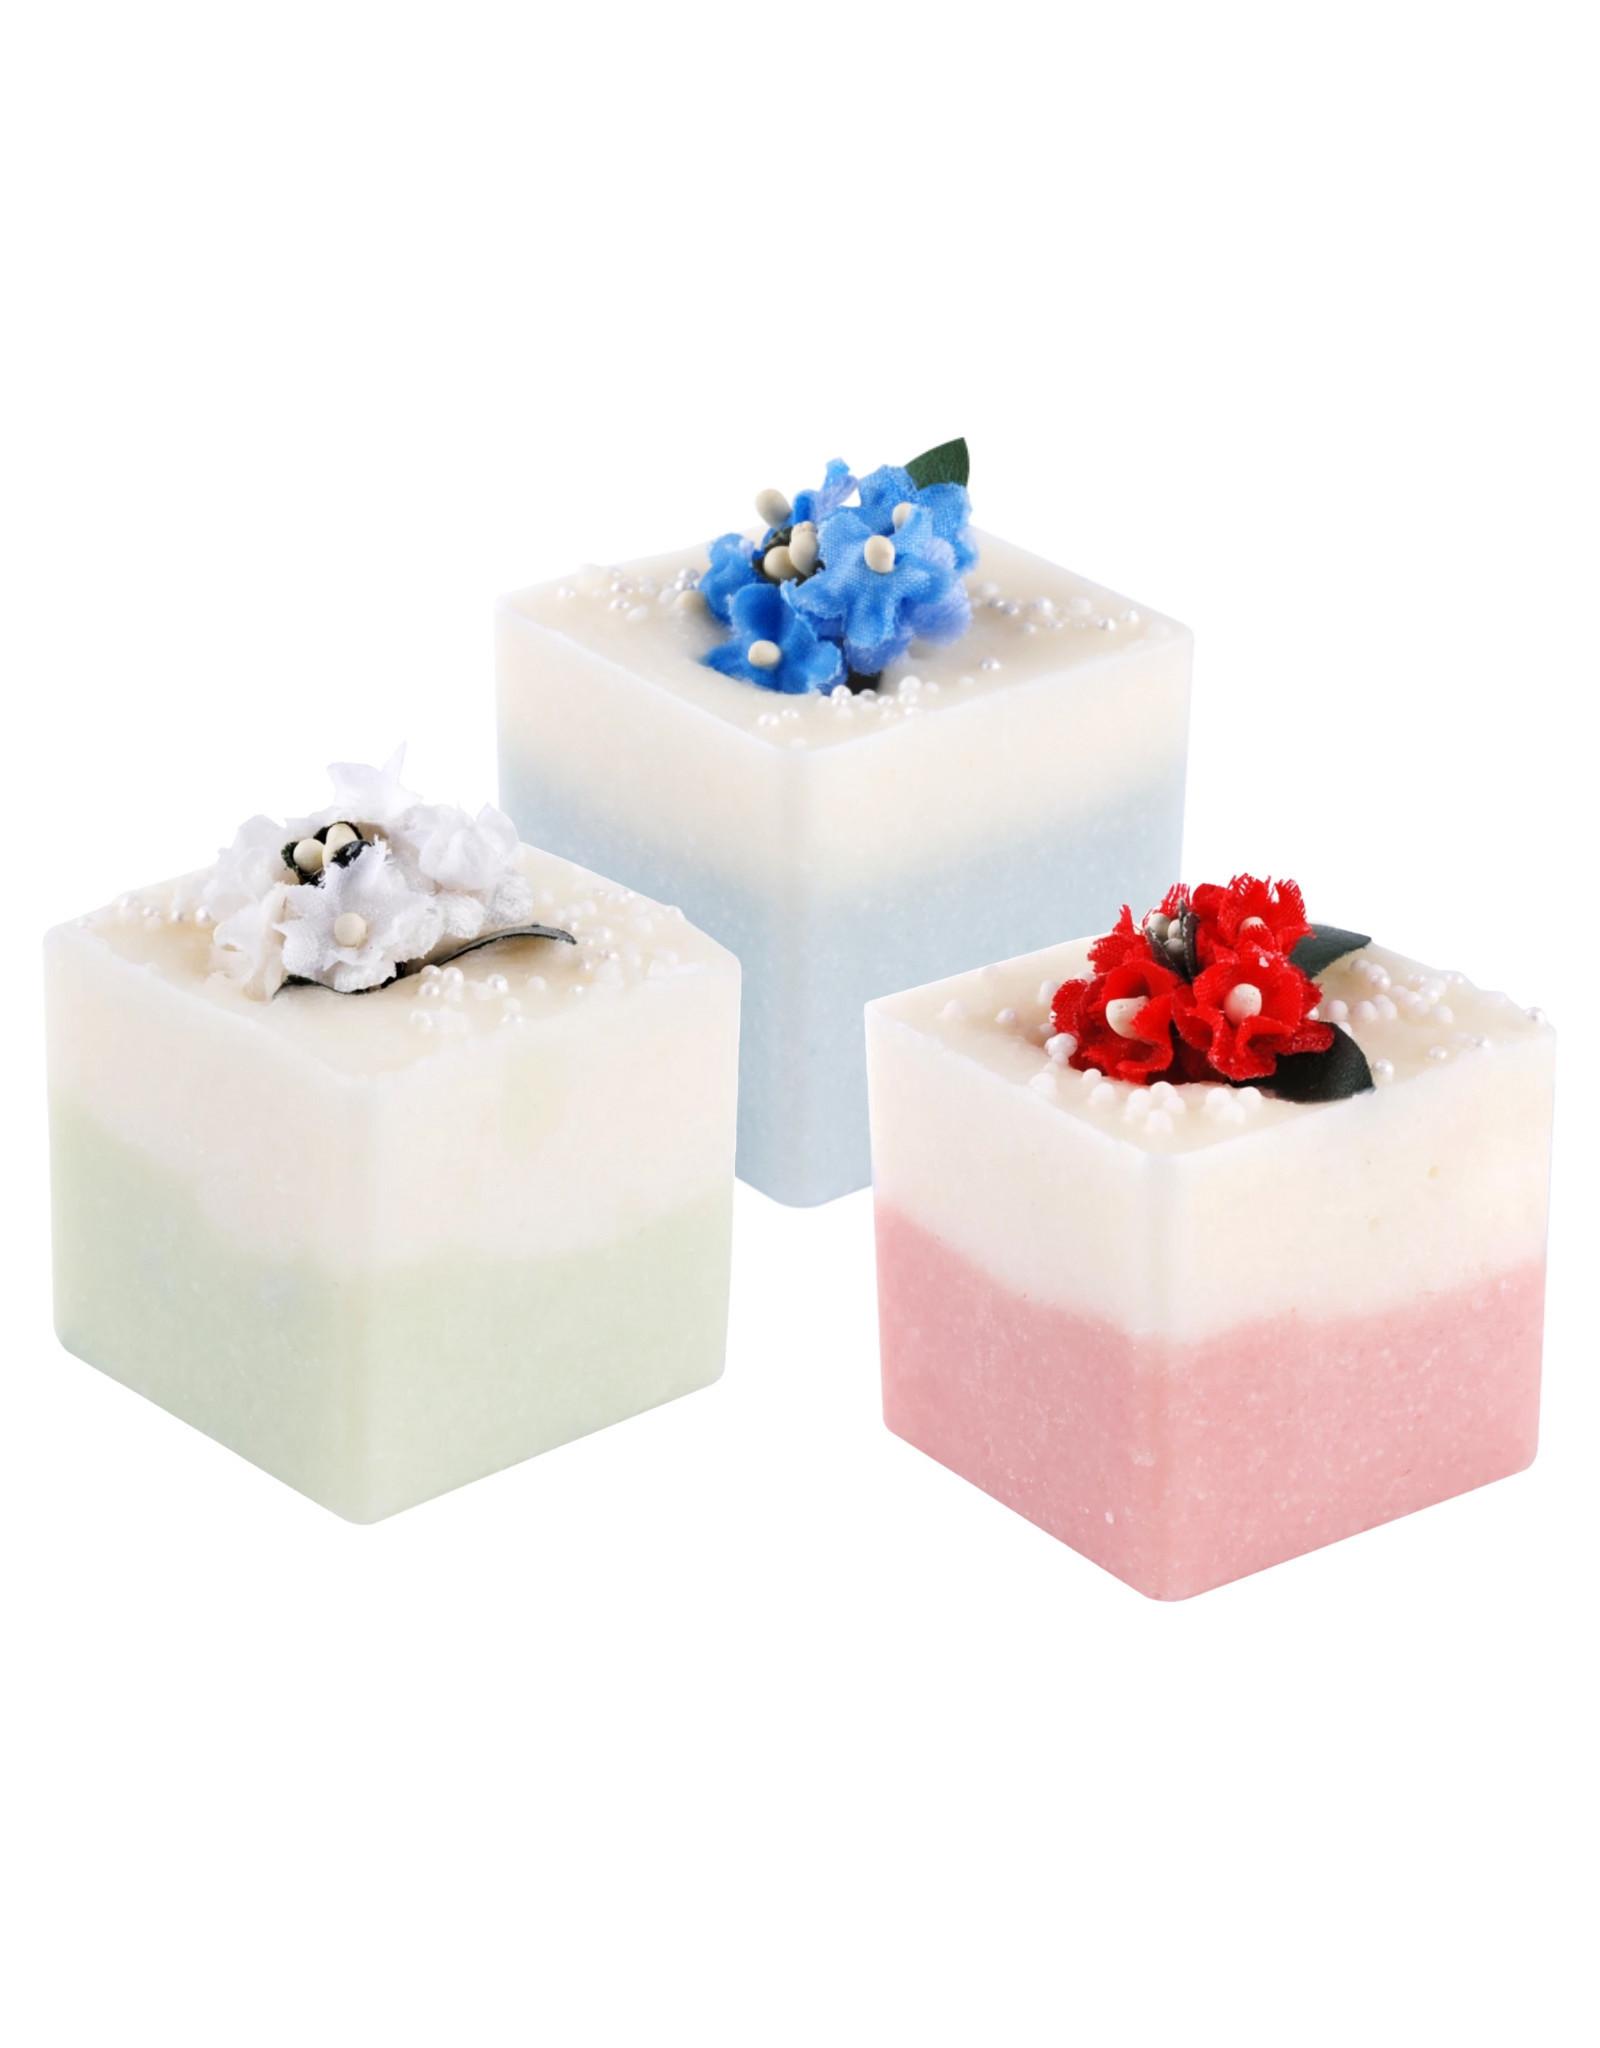 Badefee Bath Cube - Garden Party